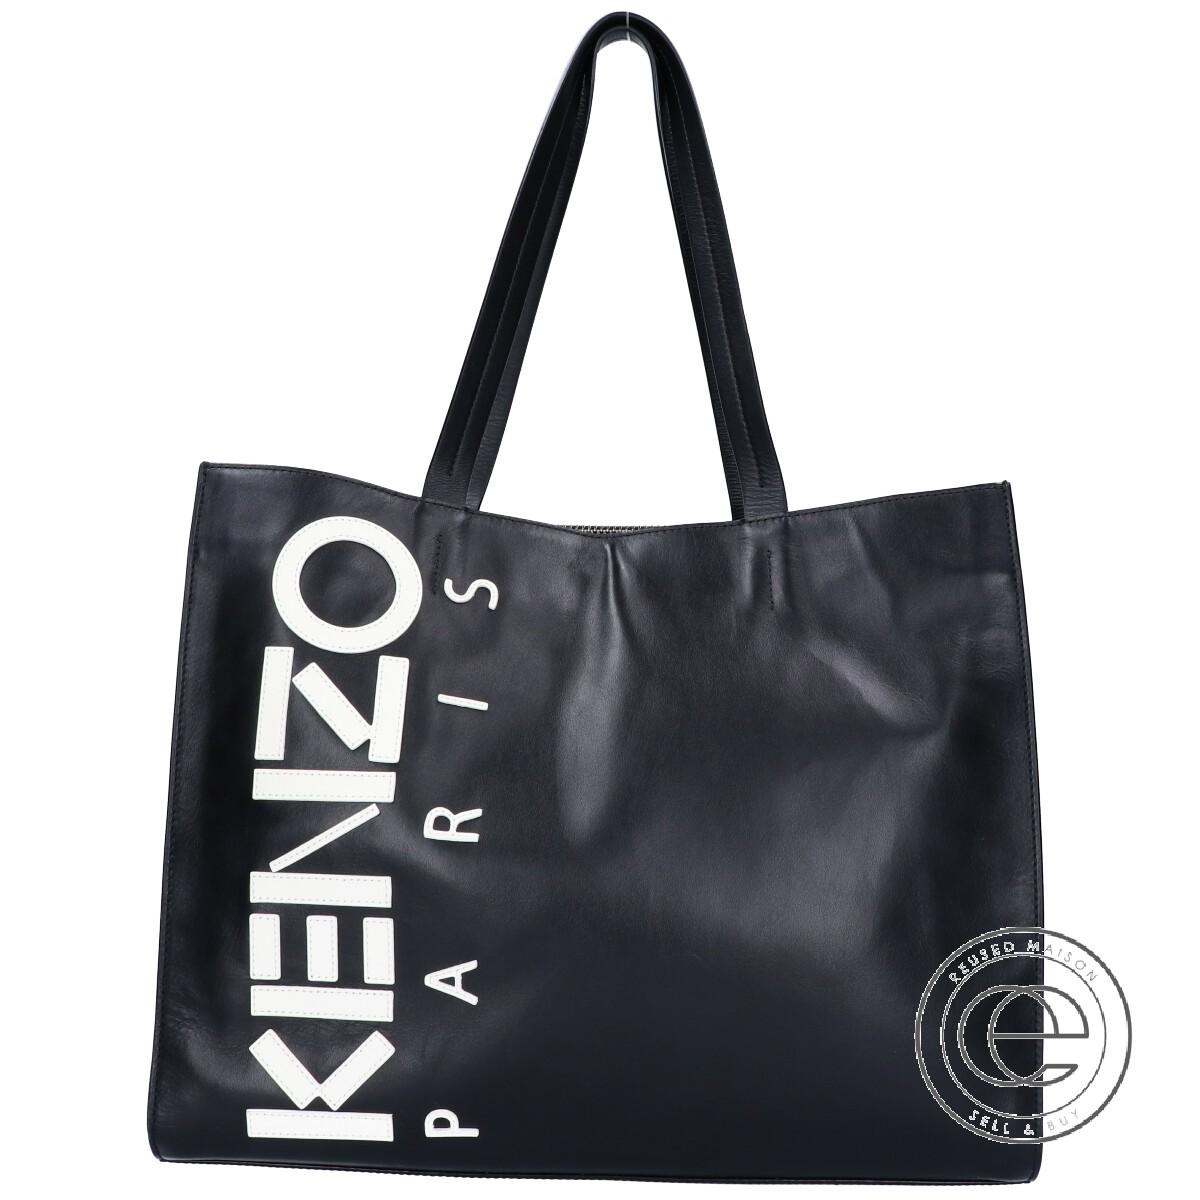 KENZO ケンゾー ロゴ レザー トートバッグ ブラック/ホワイト メンズ 【中古】